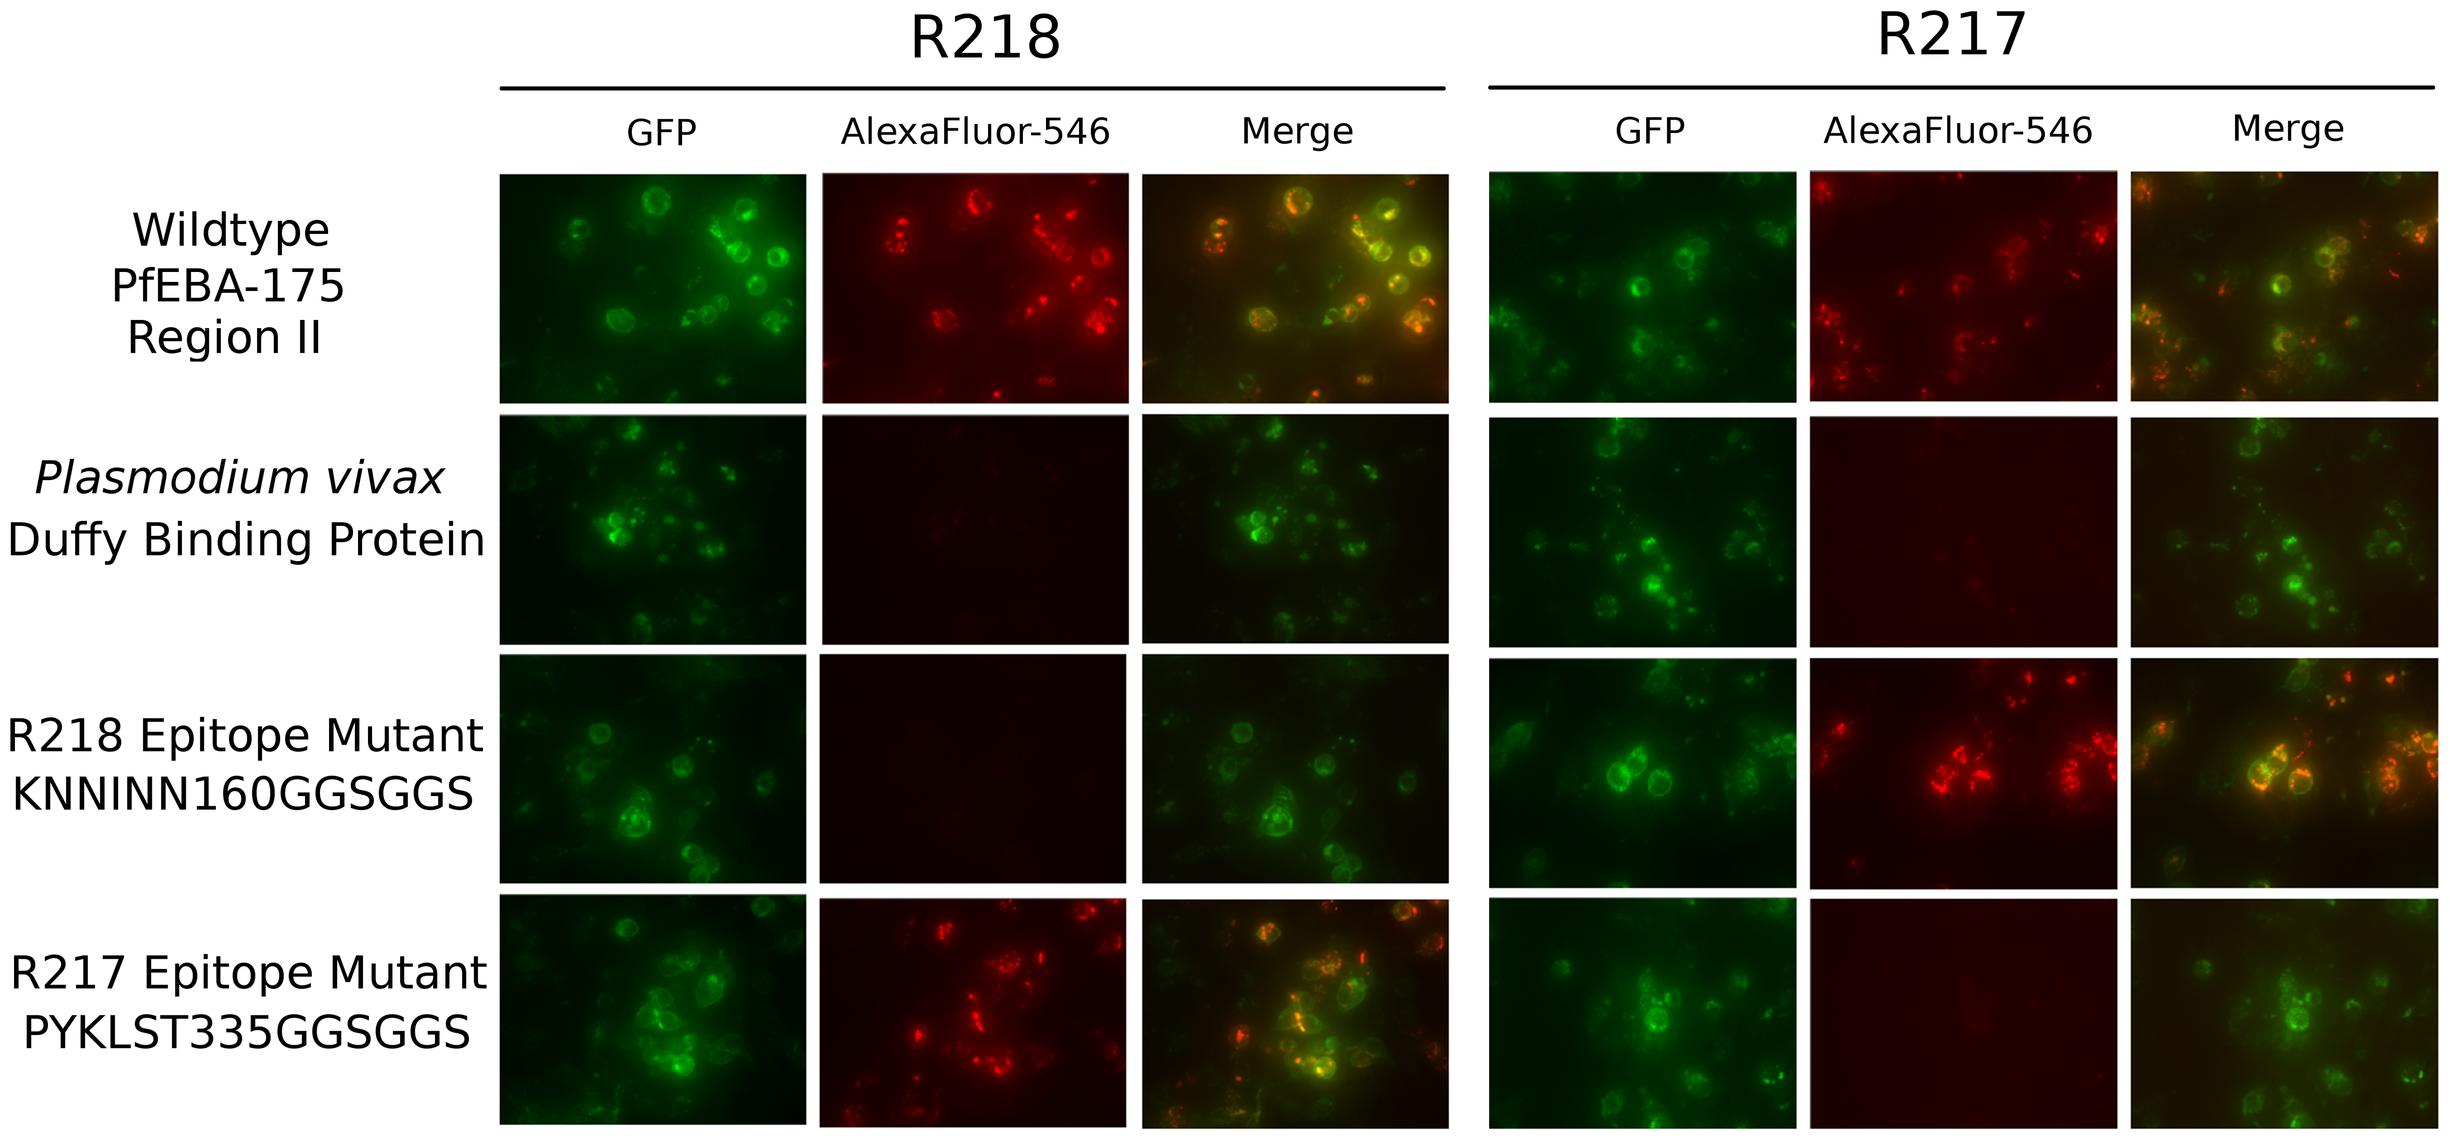 Antibody epitope identification by immunofluorescence assay.